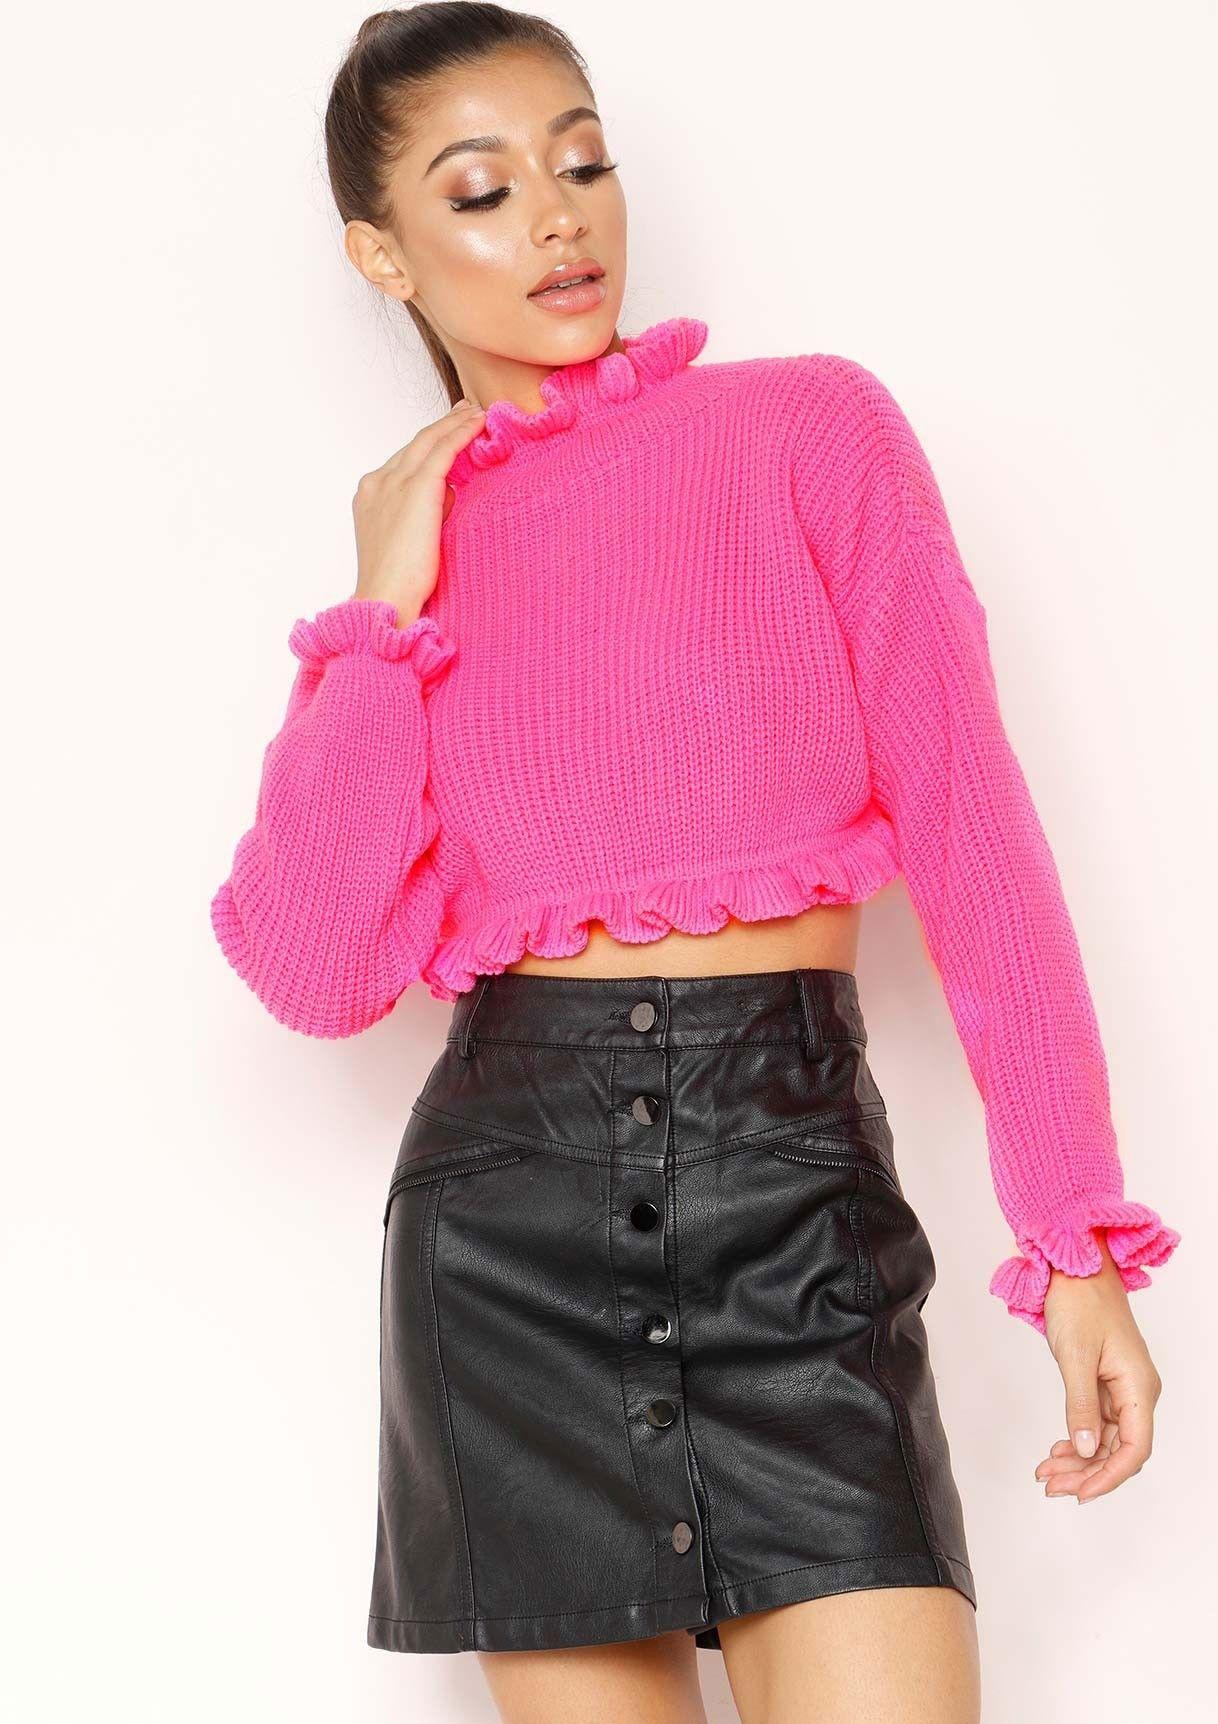 938d0b91d21 Honey Neon Pink Cropped Frill Knit Jumper | ⚡ neon dream ...